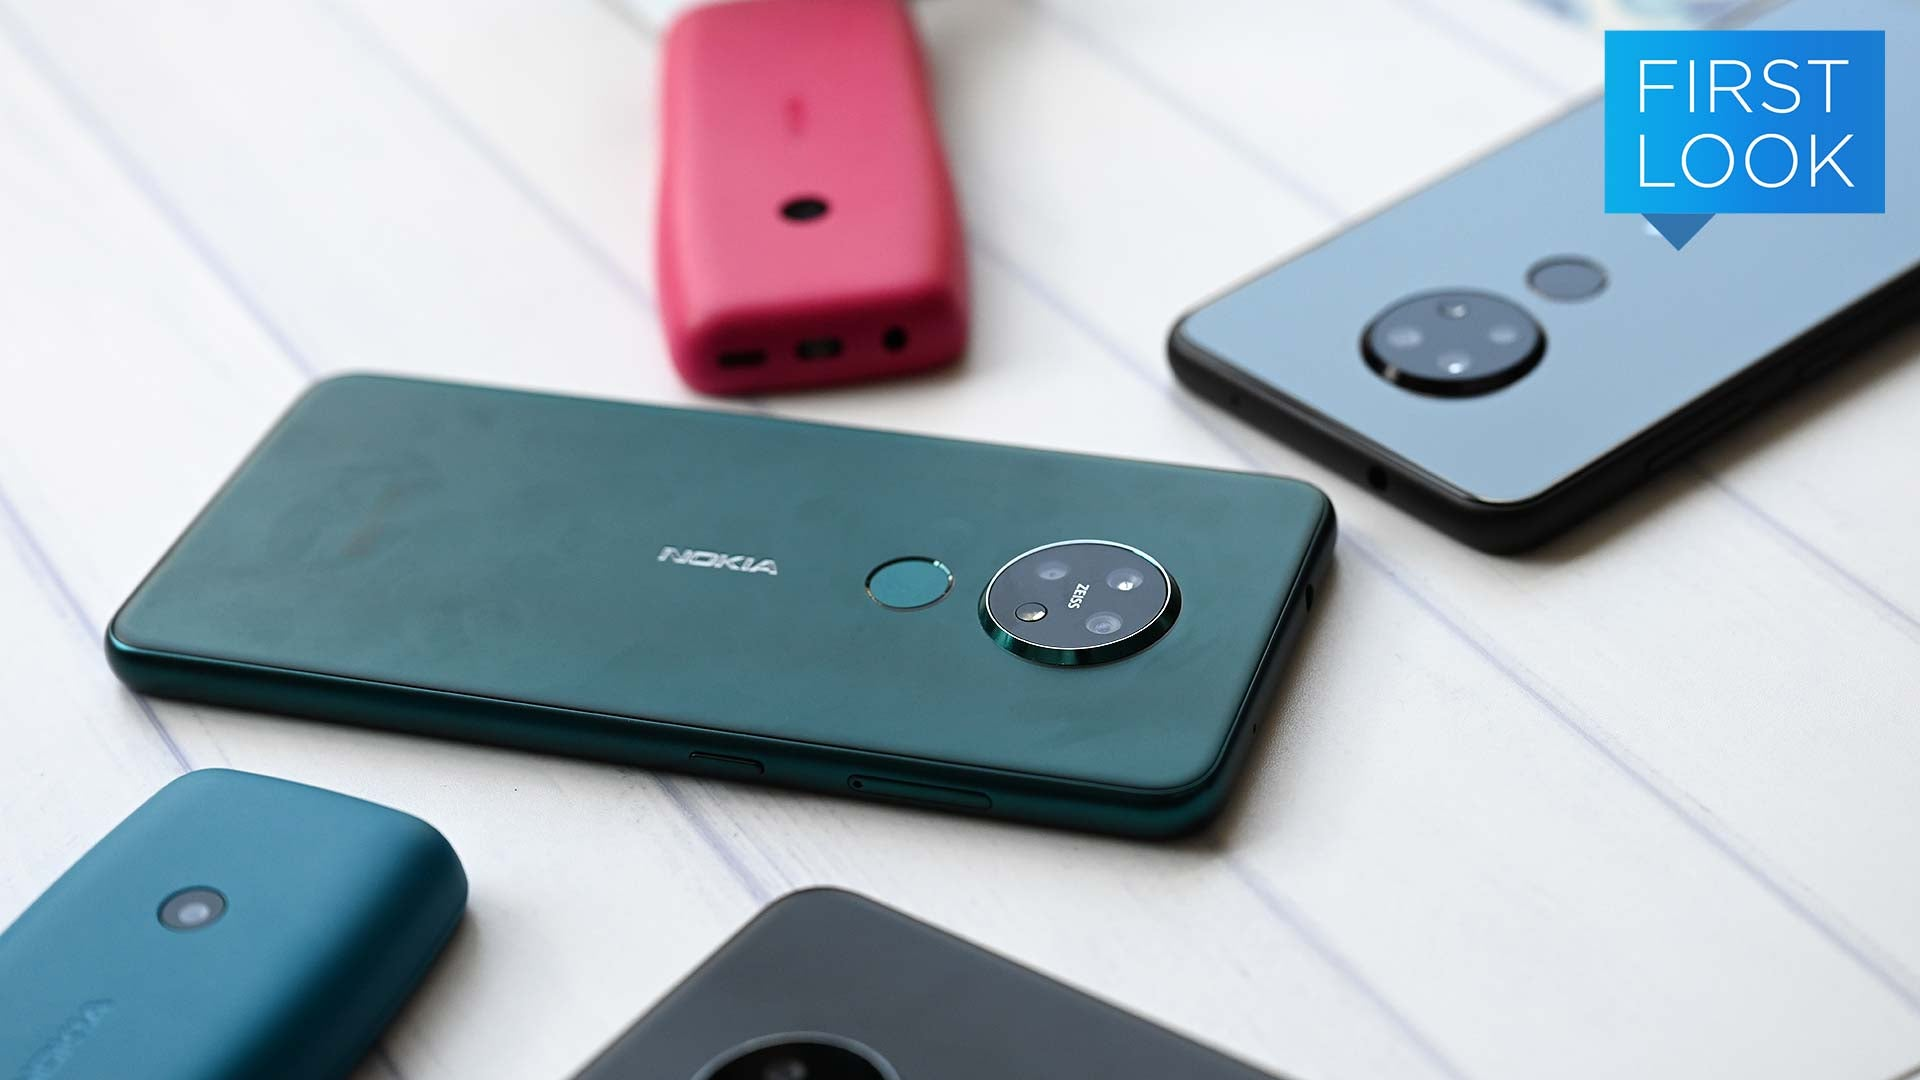 Nokia Put A Huge 48MP Camera On Its Newest Midrange Phone